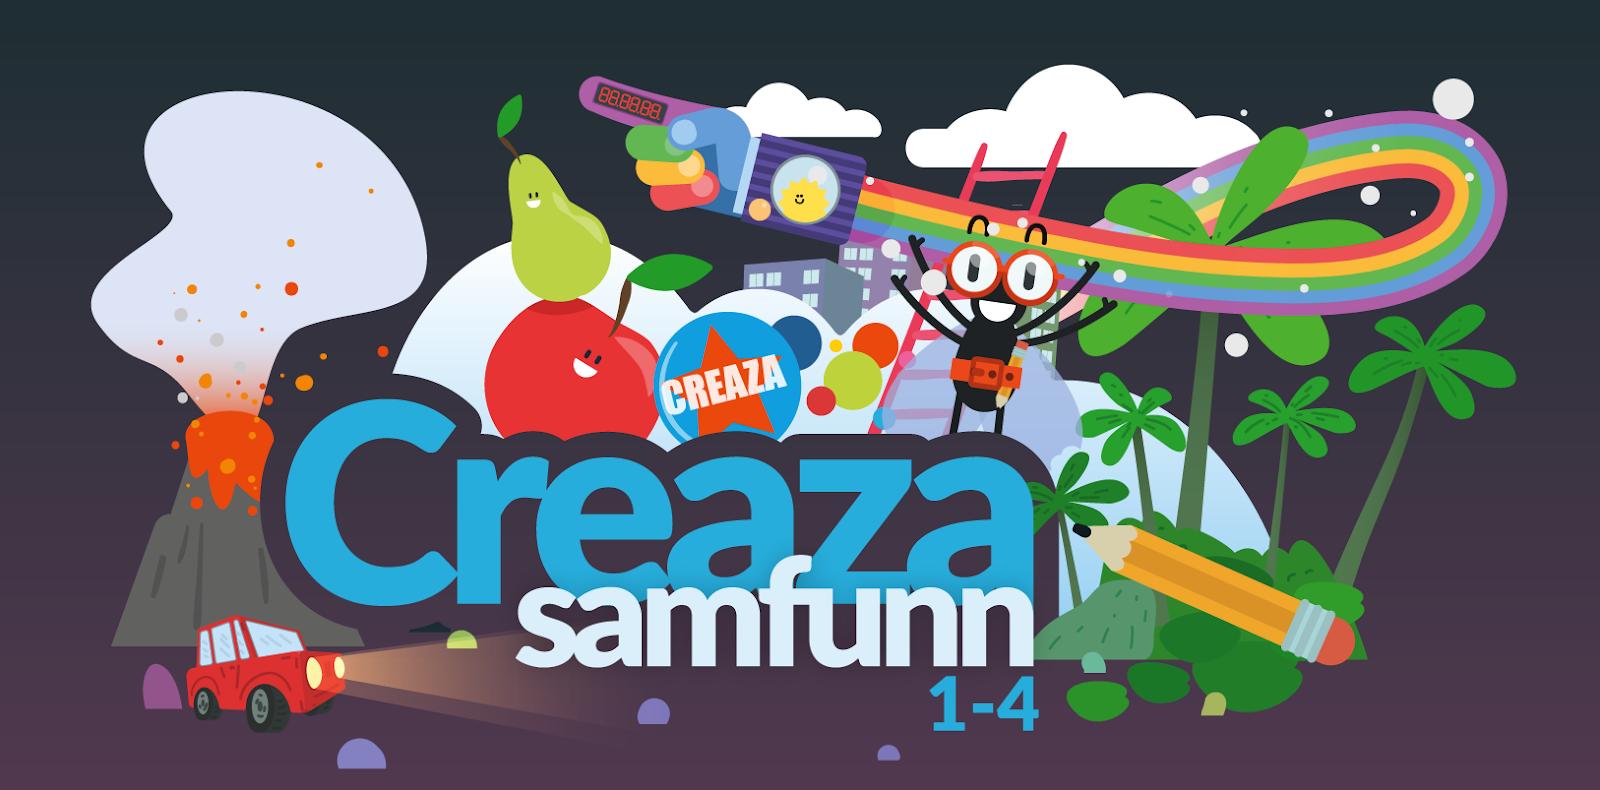 1-4 logo